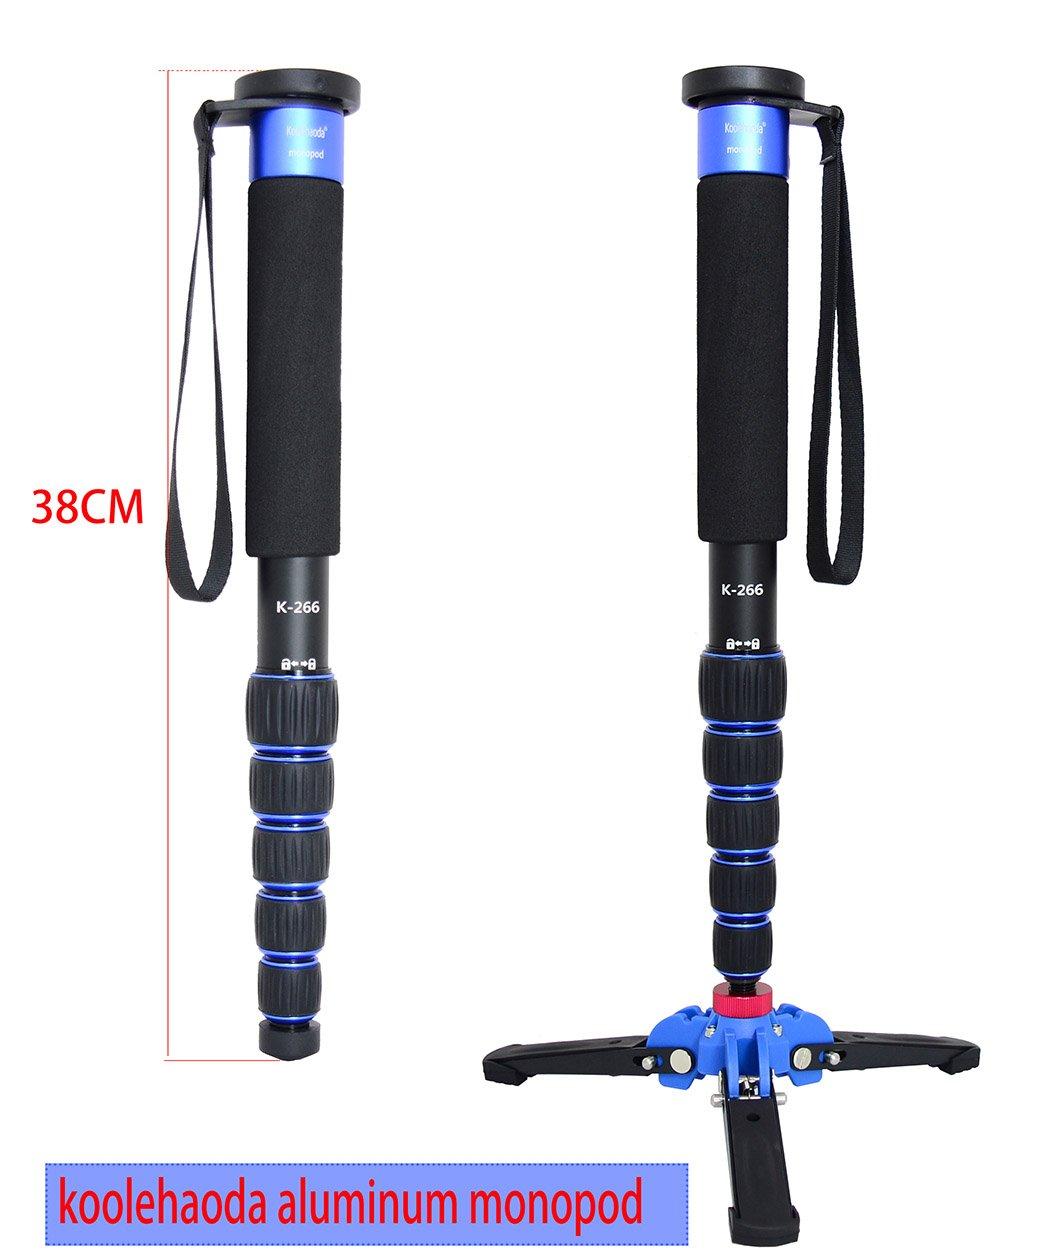 "Koolehaoda Lightweight Portable 63-inches Camera Aluminium Monopod with Folding Three Feet Support Stand. 6-Section Leg, Leg max Diameter: Φ28MM, Folding Length: 420mm (16.5"").(K-266 Blue)"